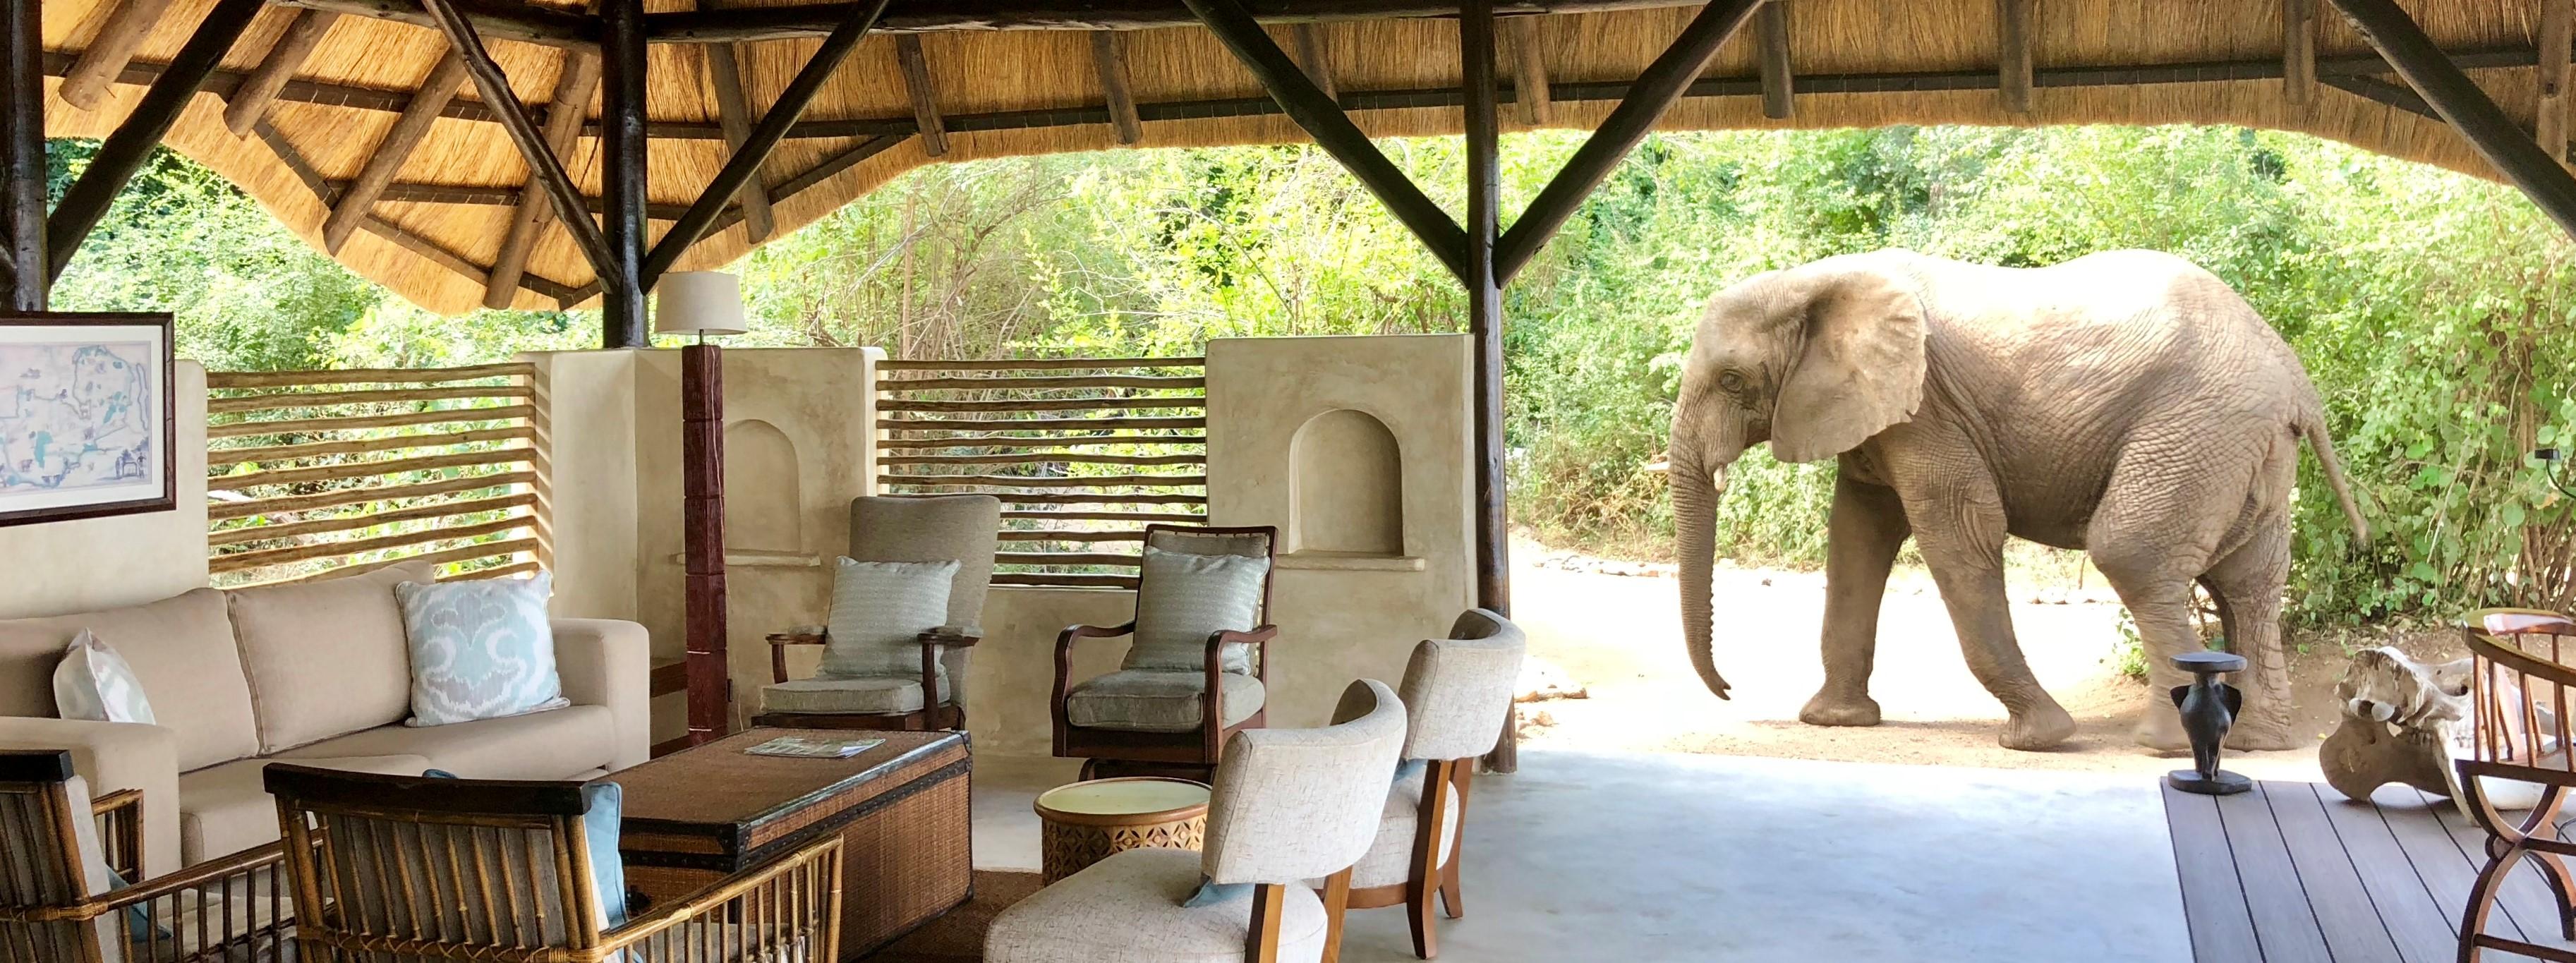 tailor-made-safari-lower-zambezi